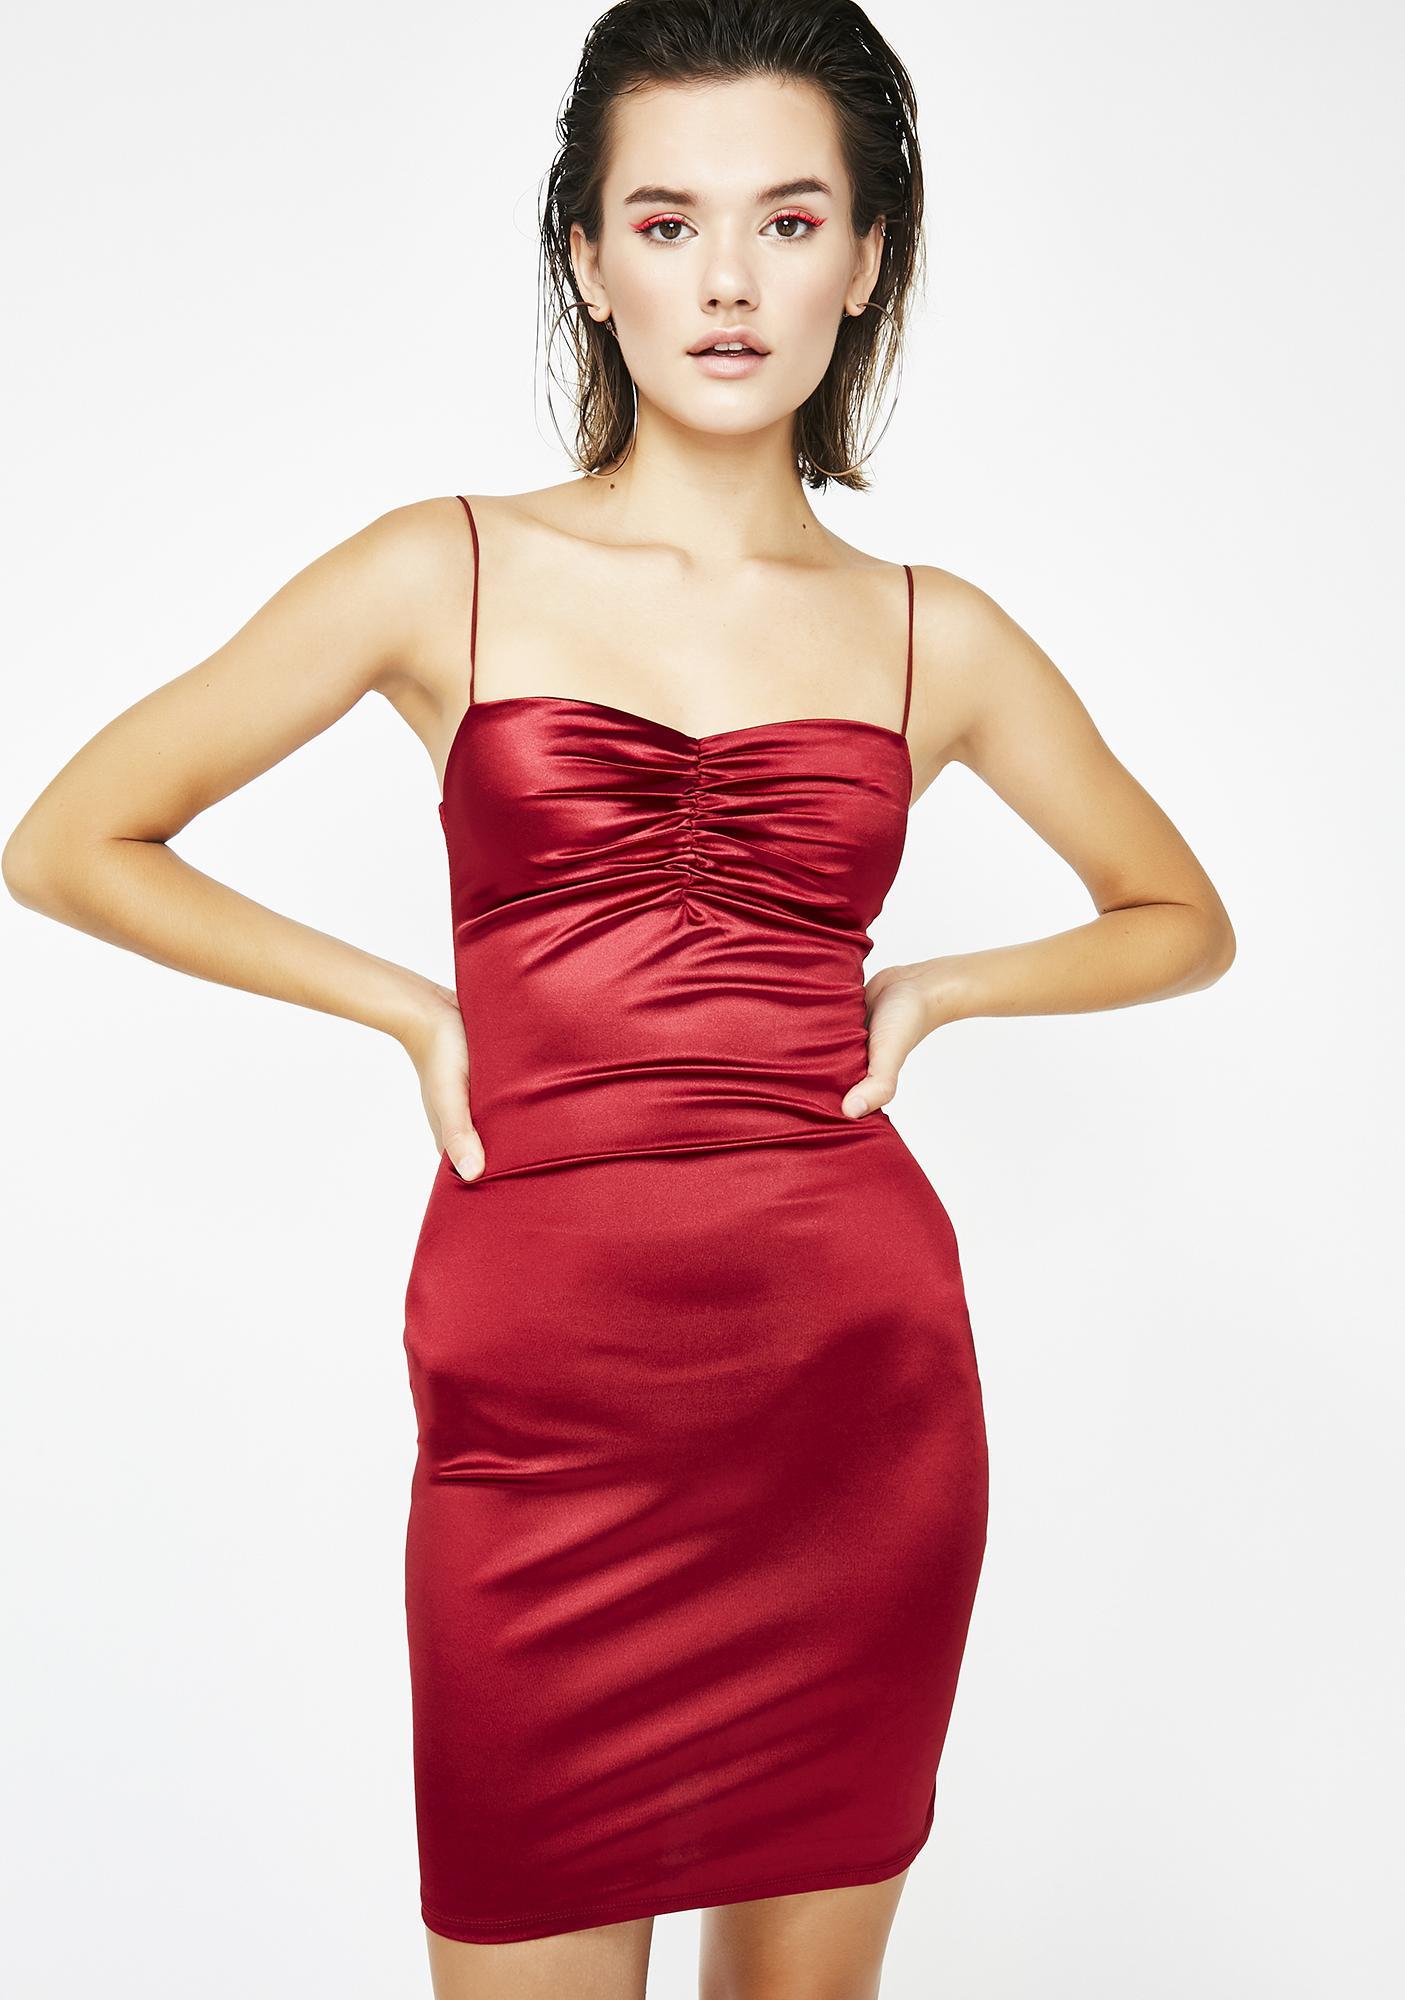 Flamin' Freak 'Em Mini Dress